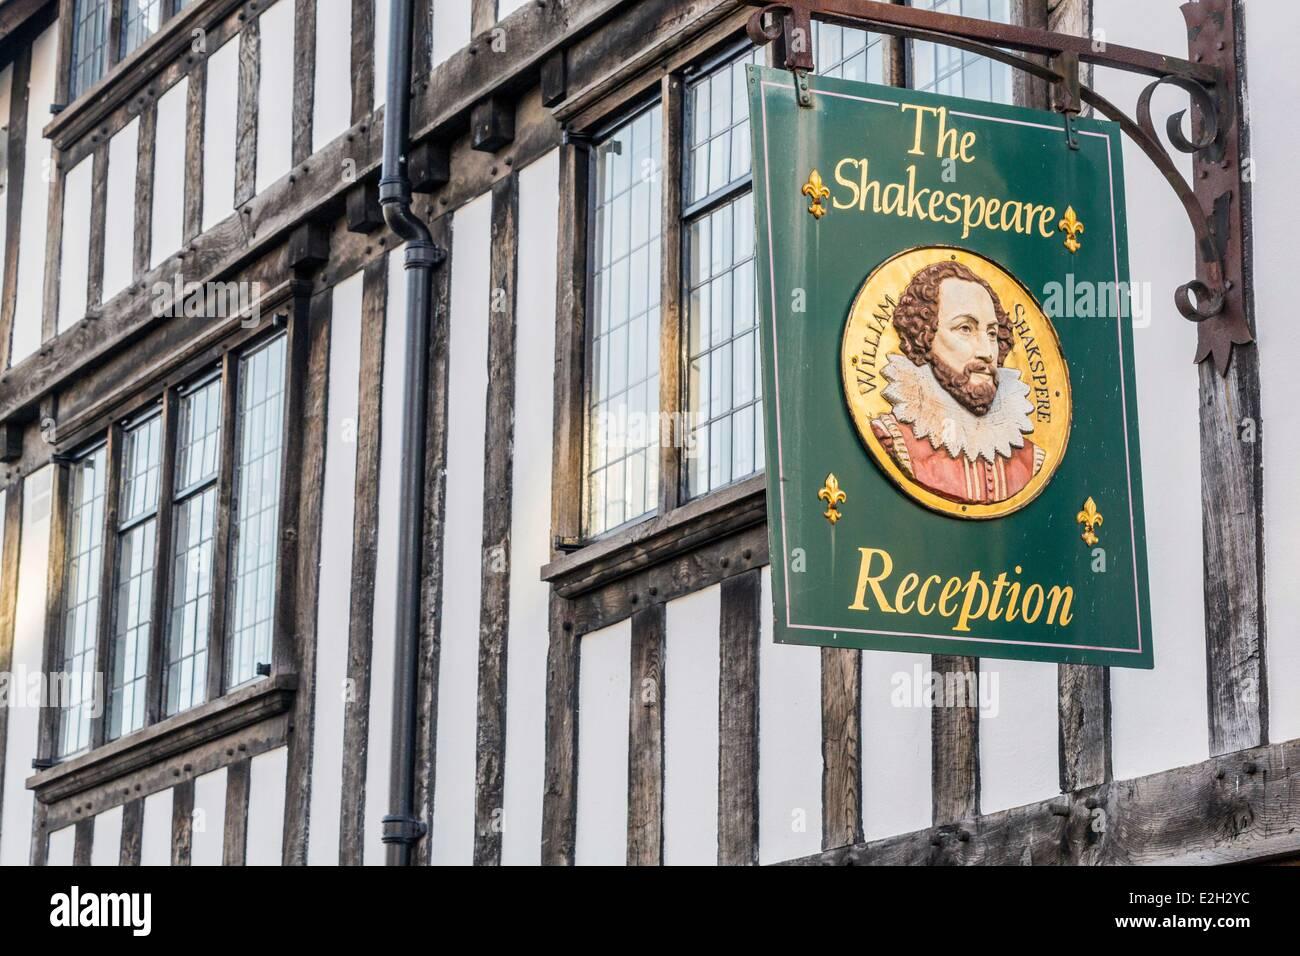 United Kingdom Warwickshire Stratford-upon-Avon Chapel Street facade Shakespeare Hotel - Stock Image